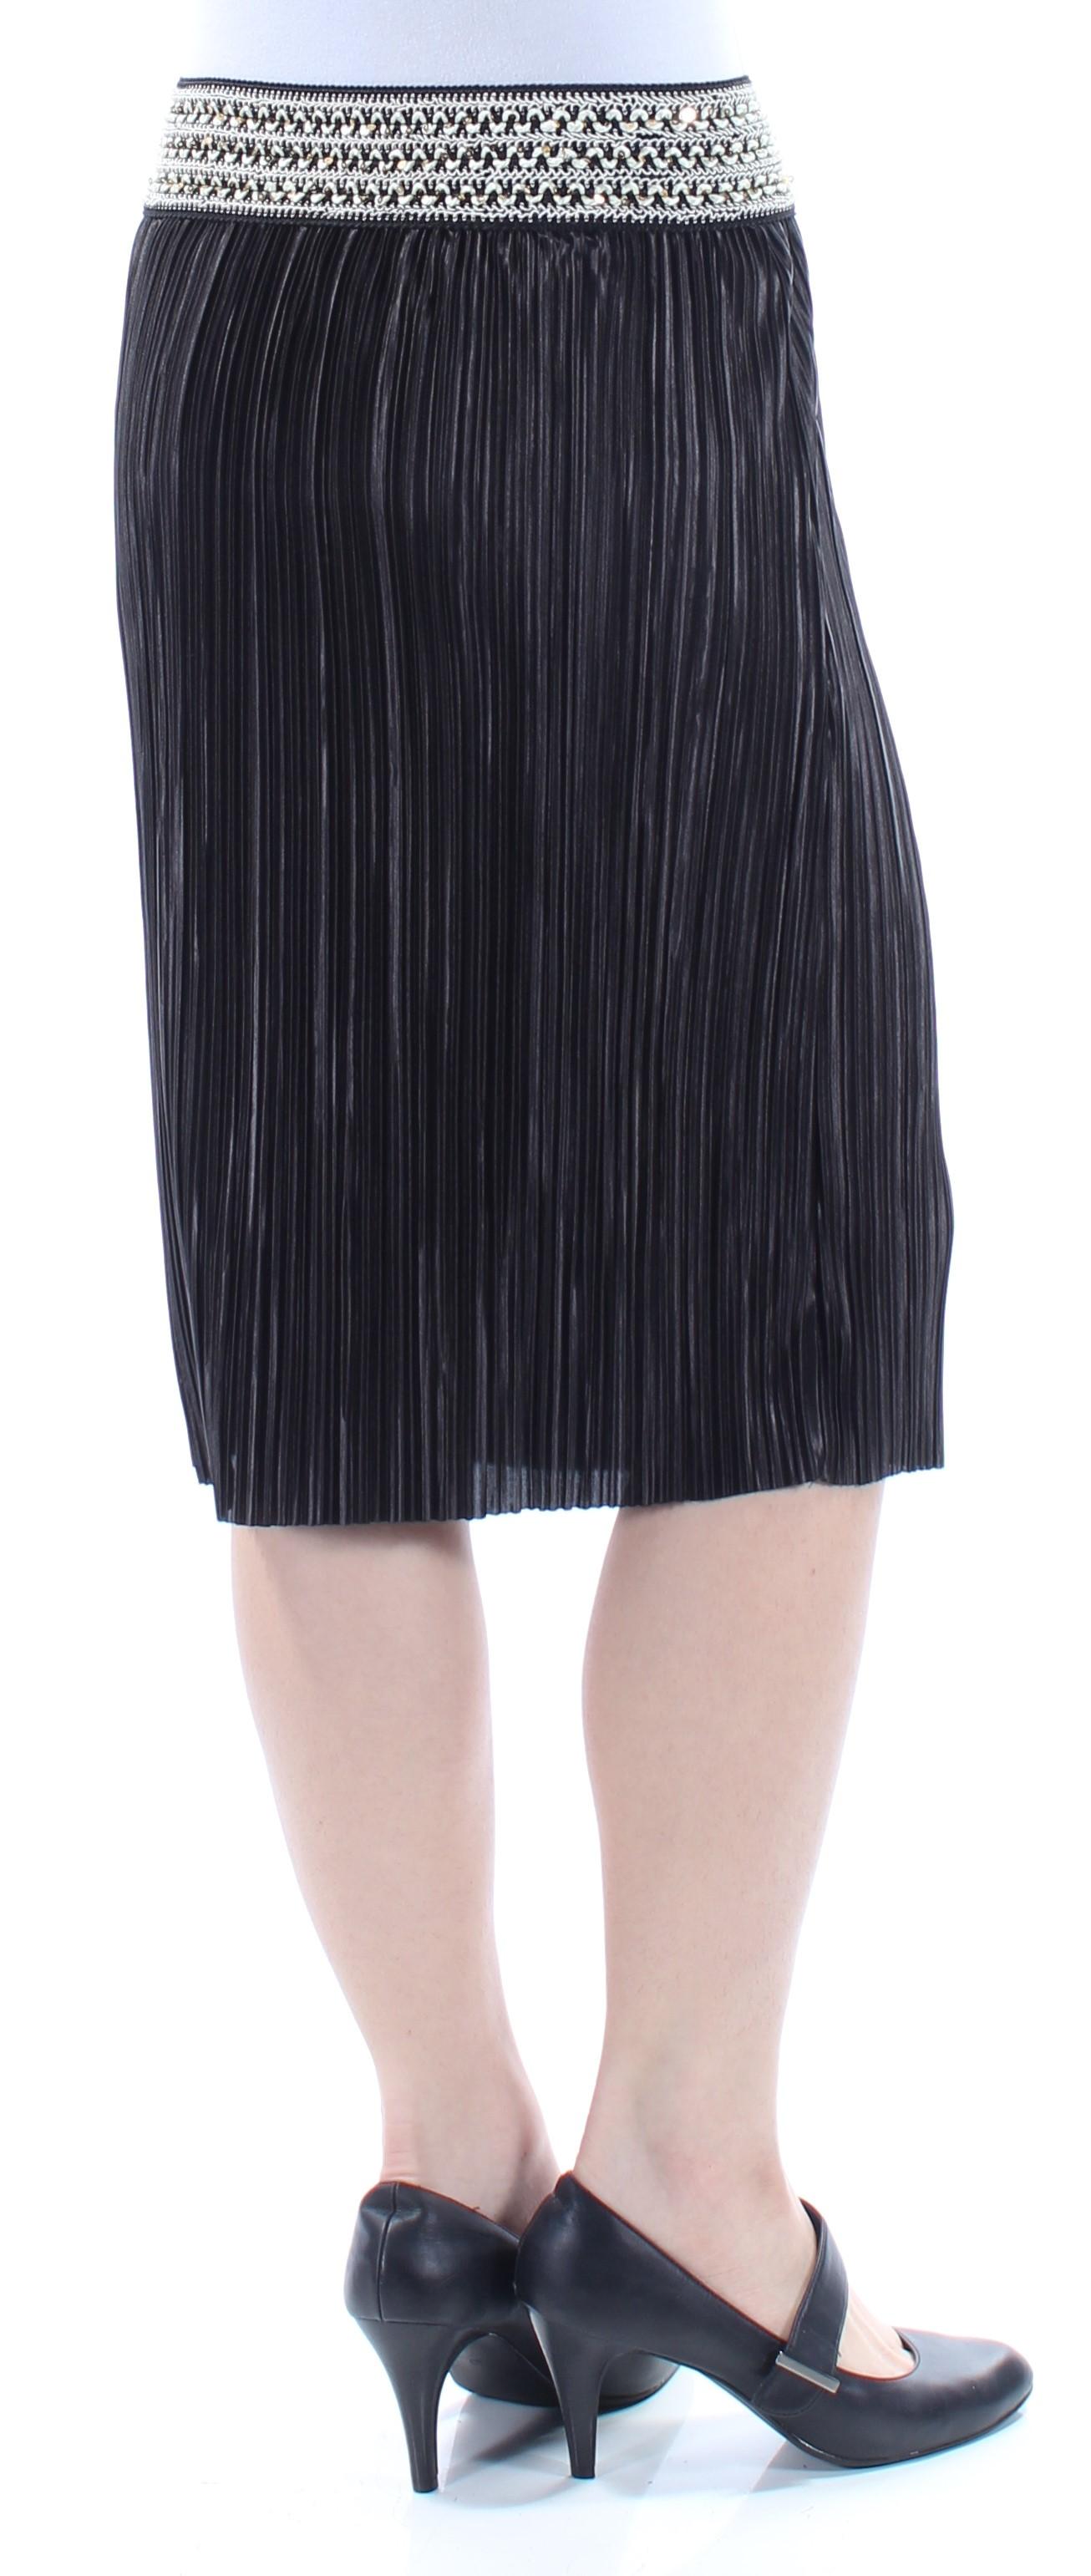 dcf6ee2cb4d1b MSK  59 Womens New 1360 Black Sequined Accordion Pleat Skirt S B+B ...